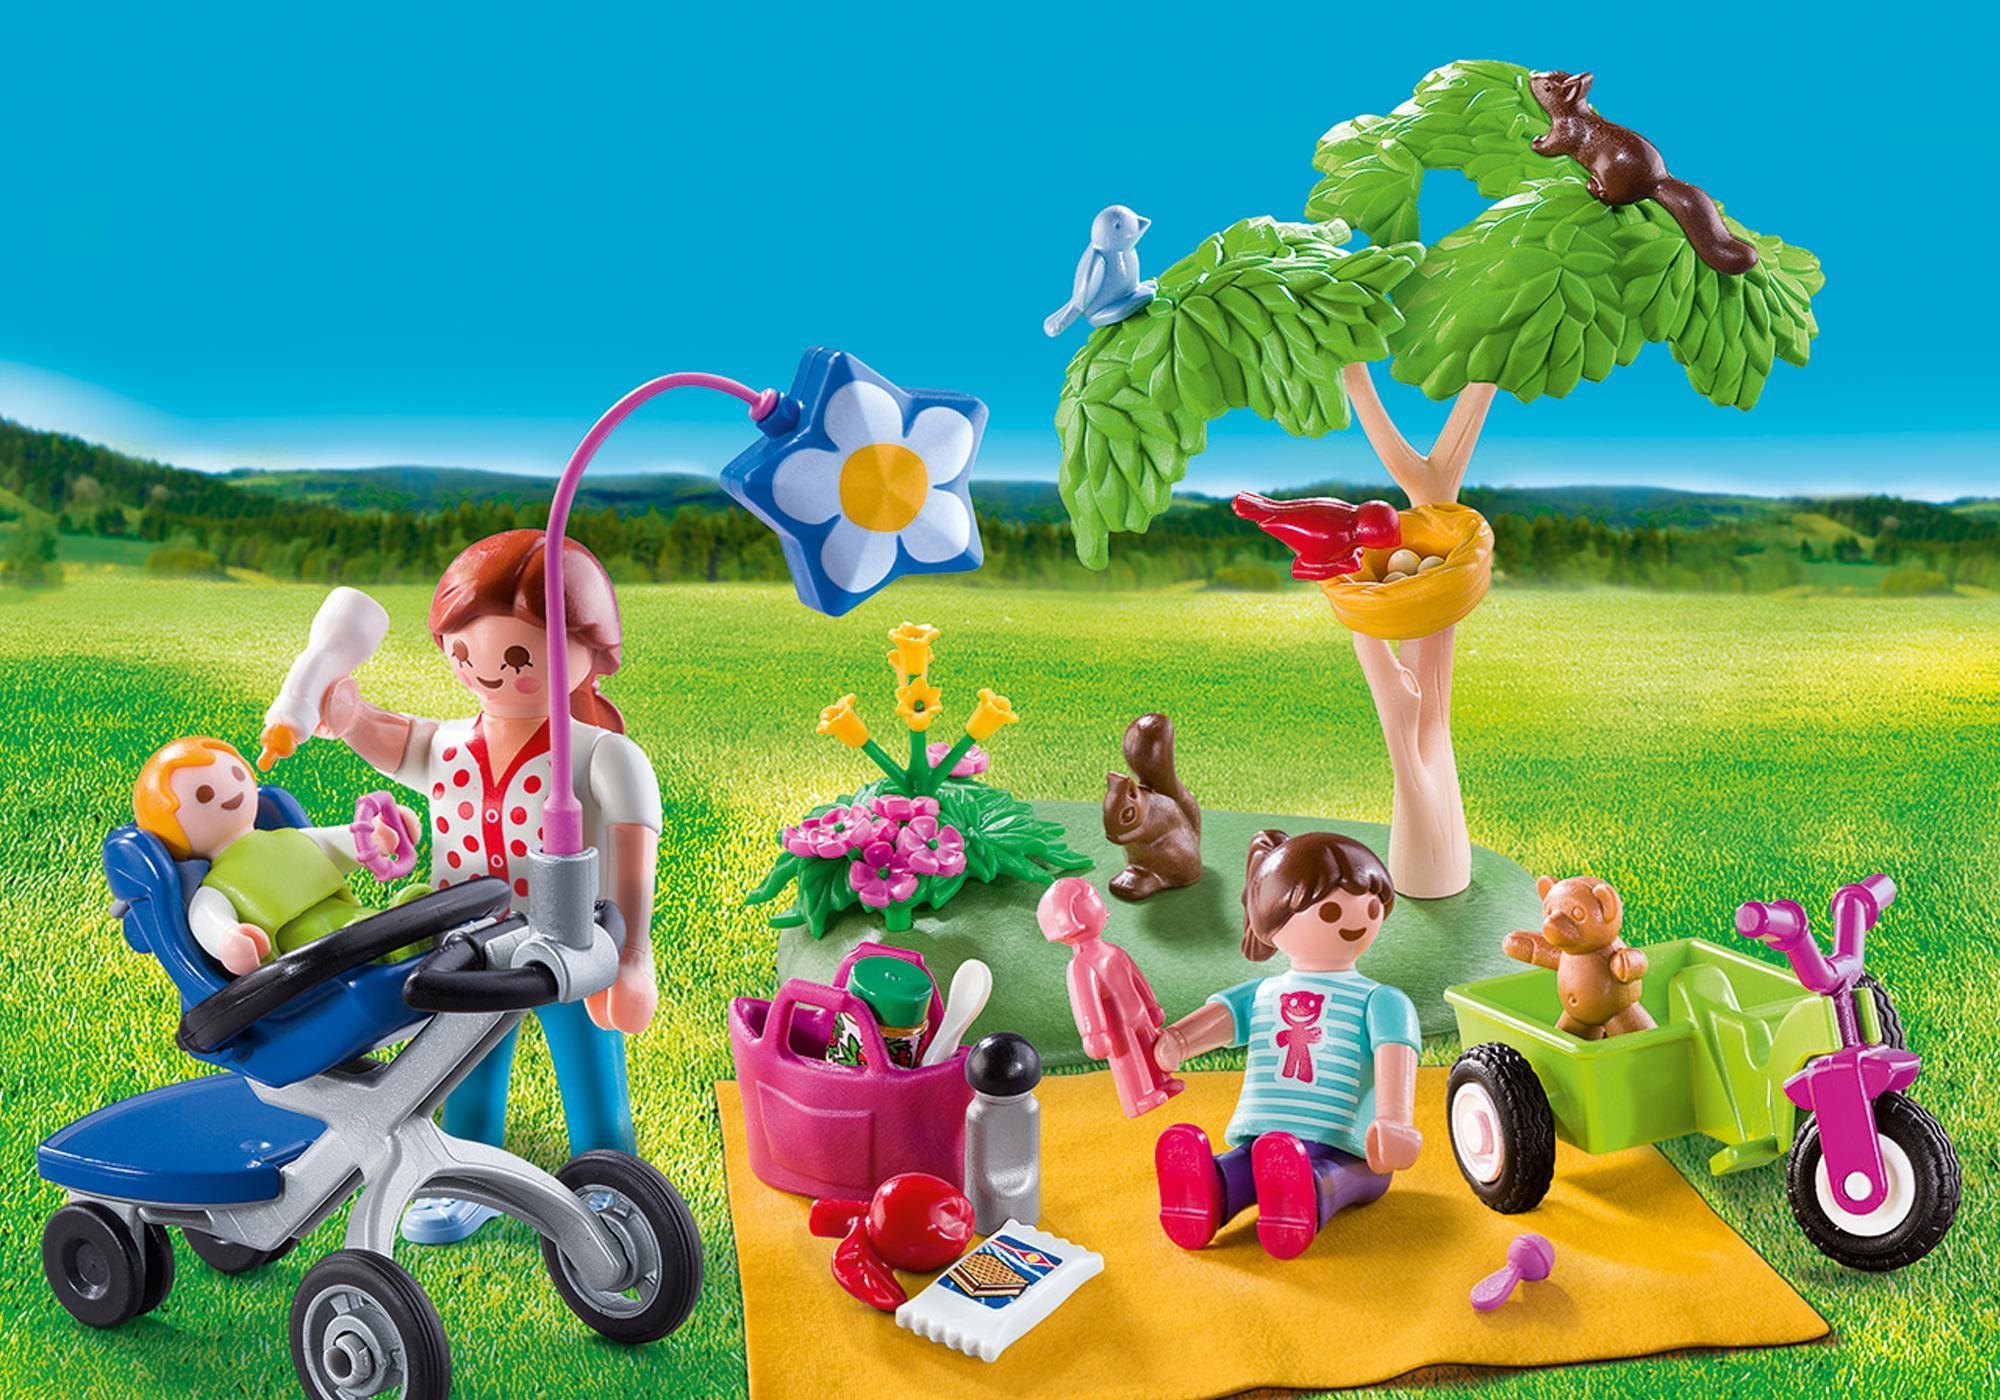 http://media.playmobil.com/i/playmobil/9103_product_detail/Family Picnic Carry Case